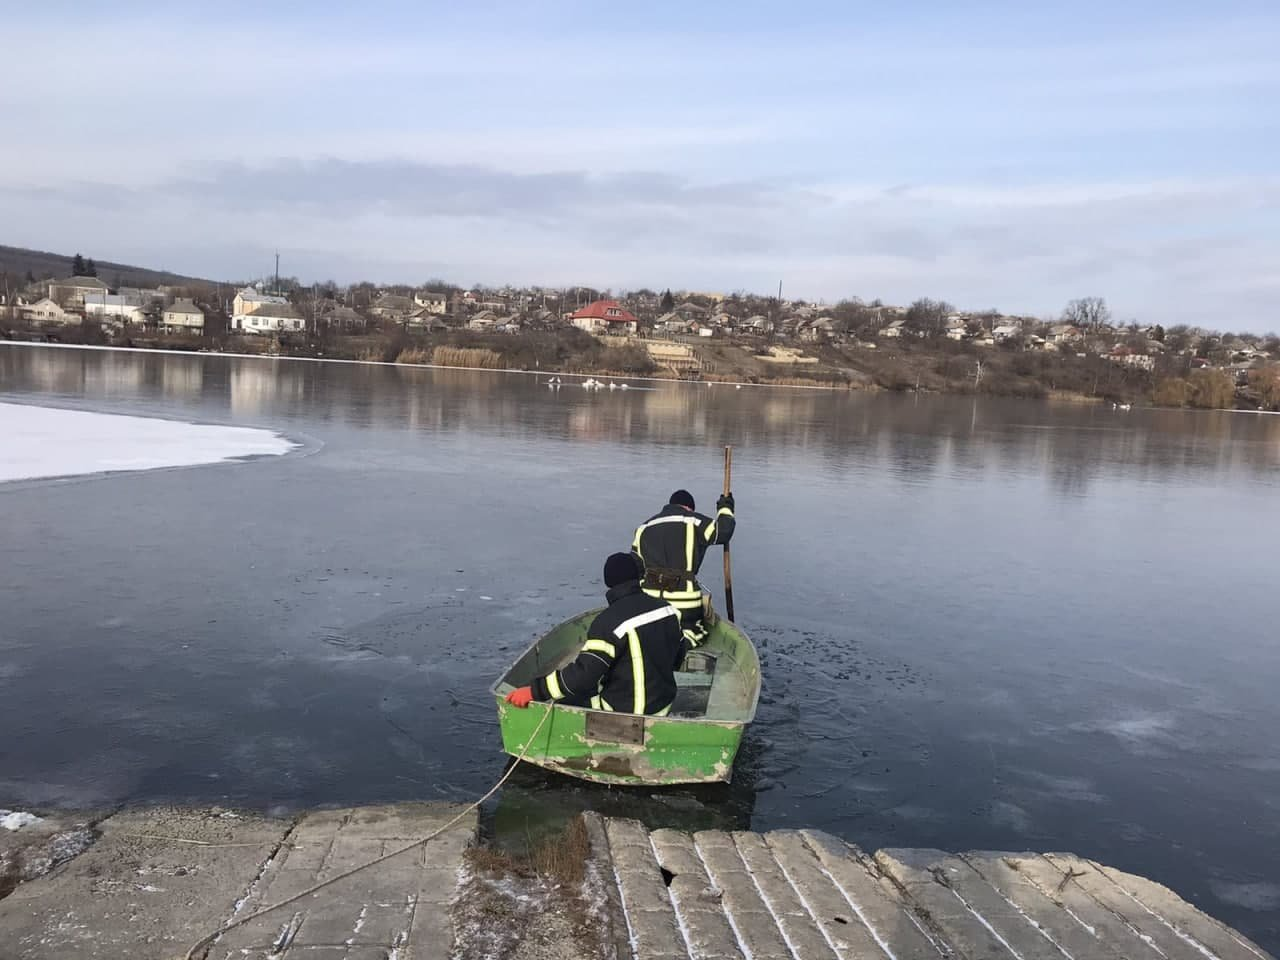 Спасатели в Одесской области освободили 16 лебедей от ледяного плена, - ФОТО, фото-1